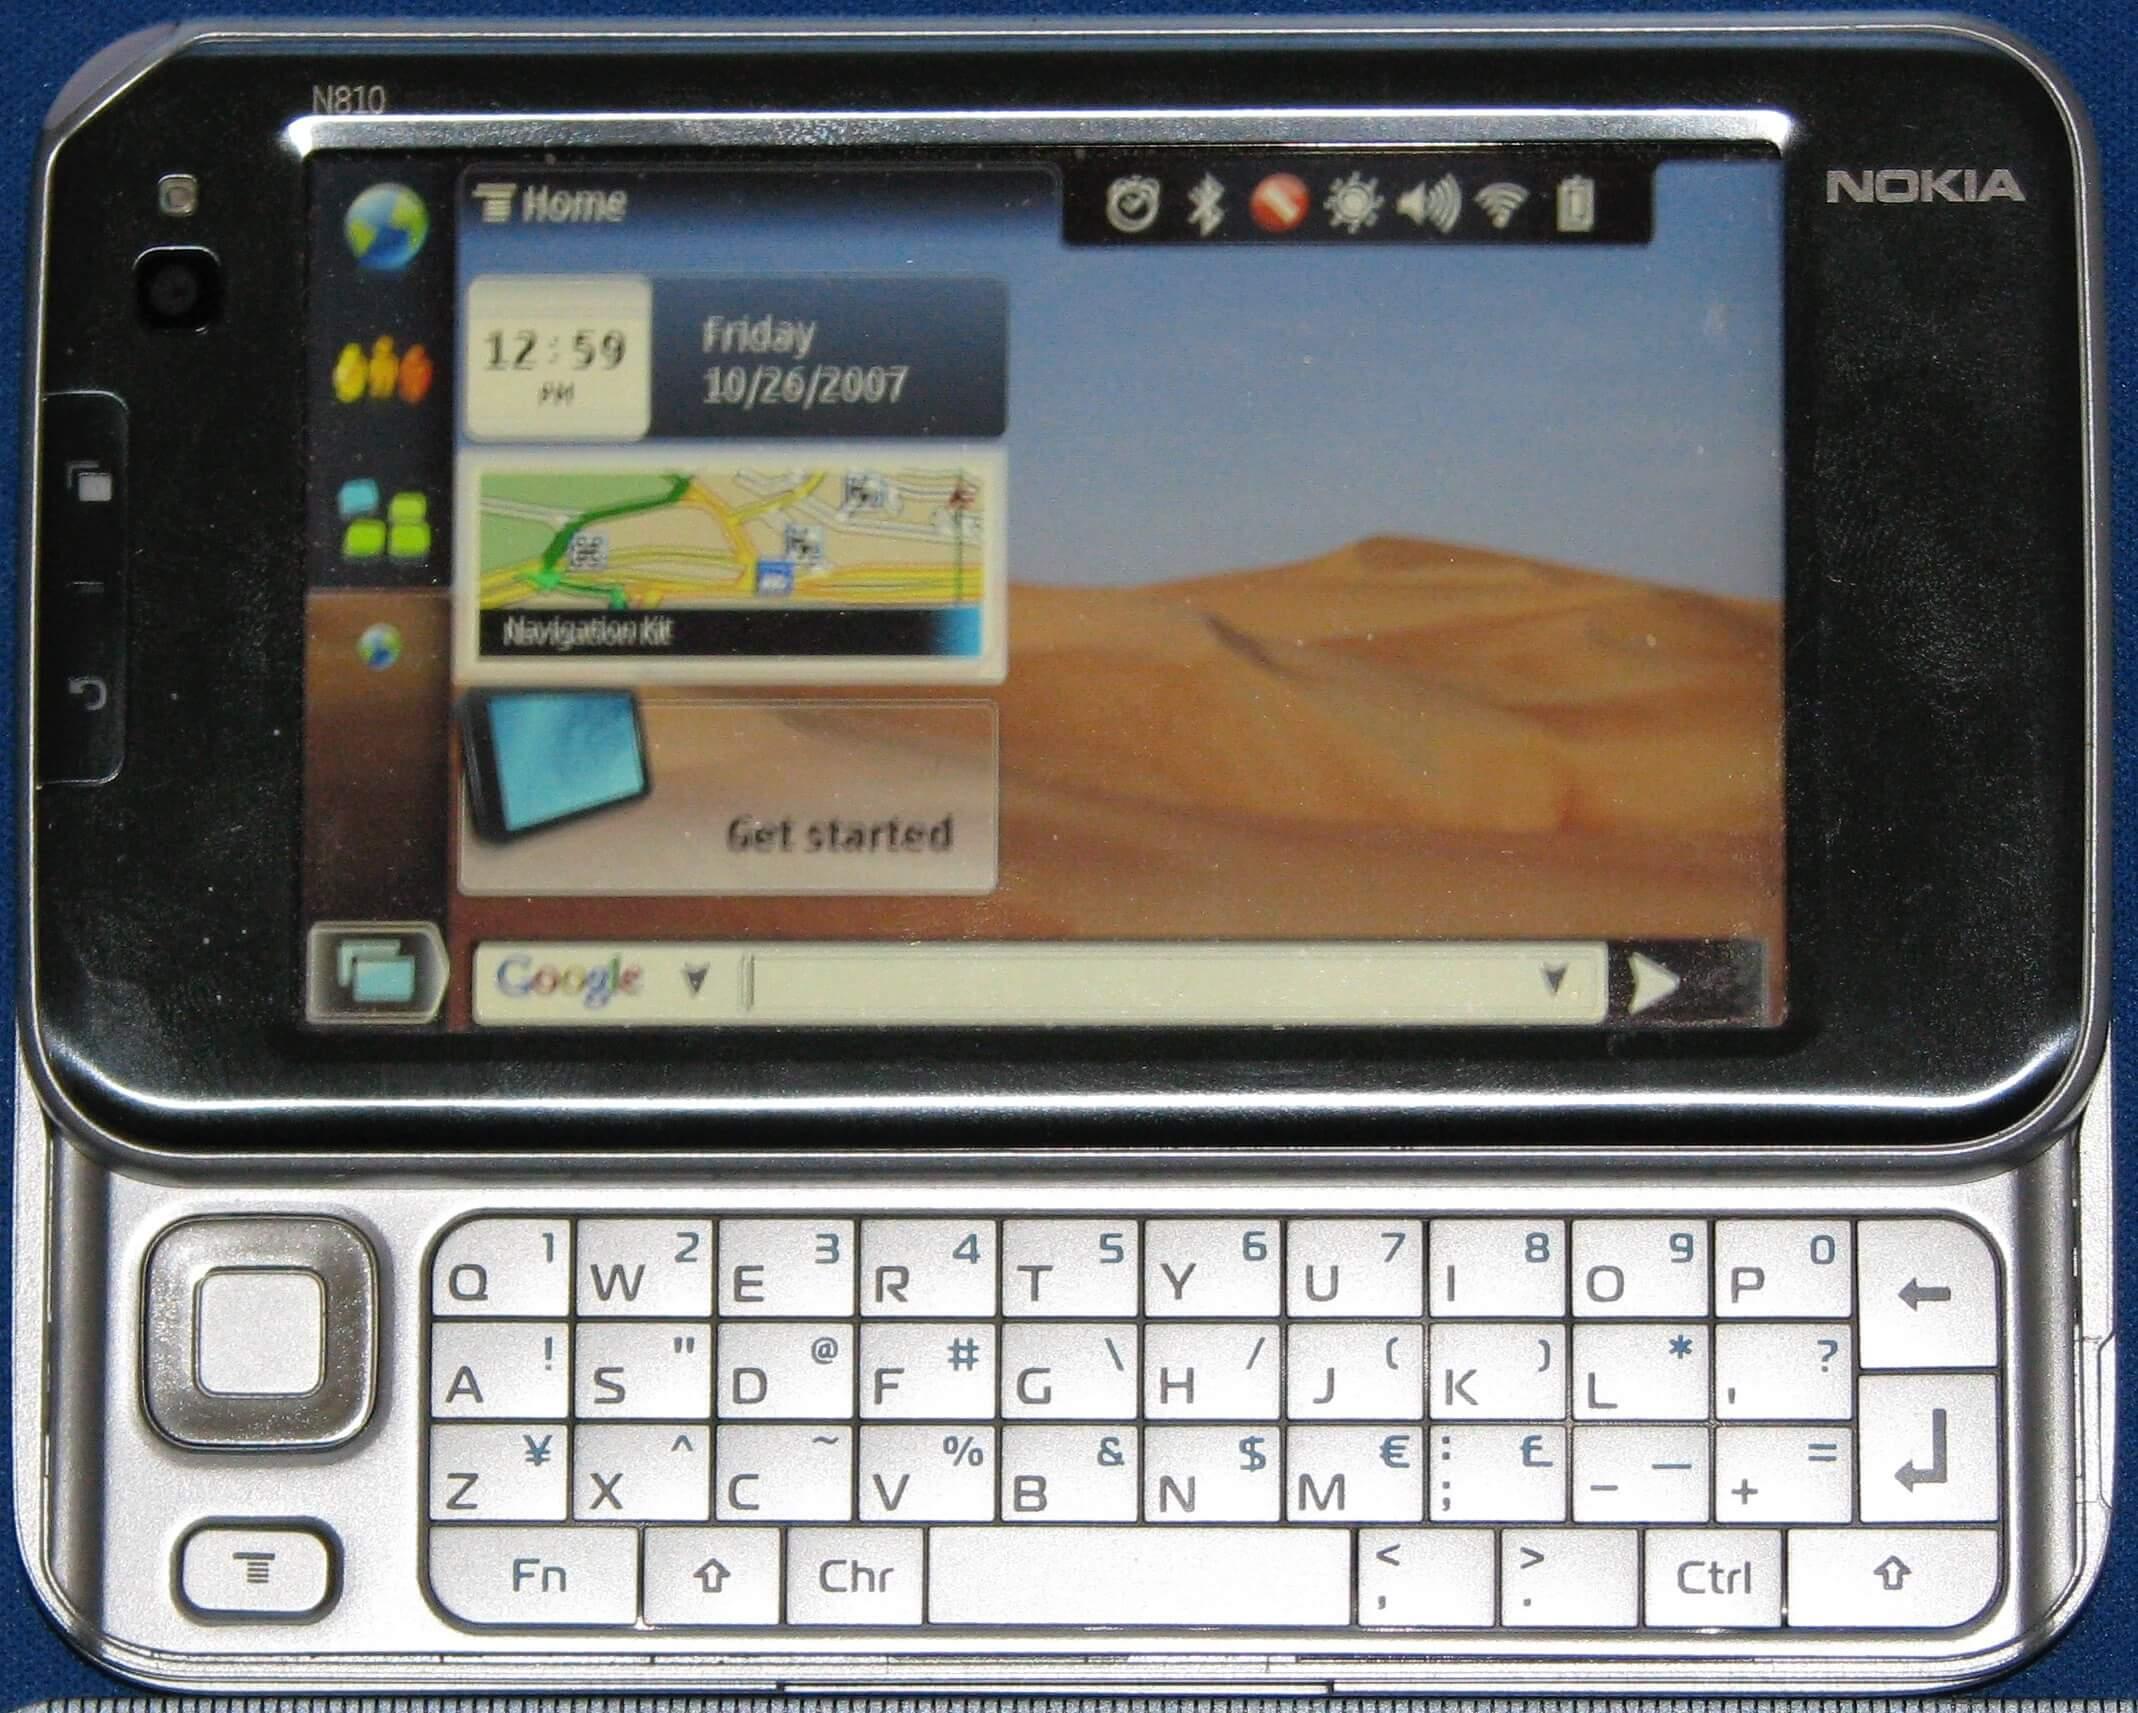 Представлен Nokia N810